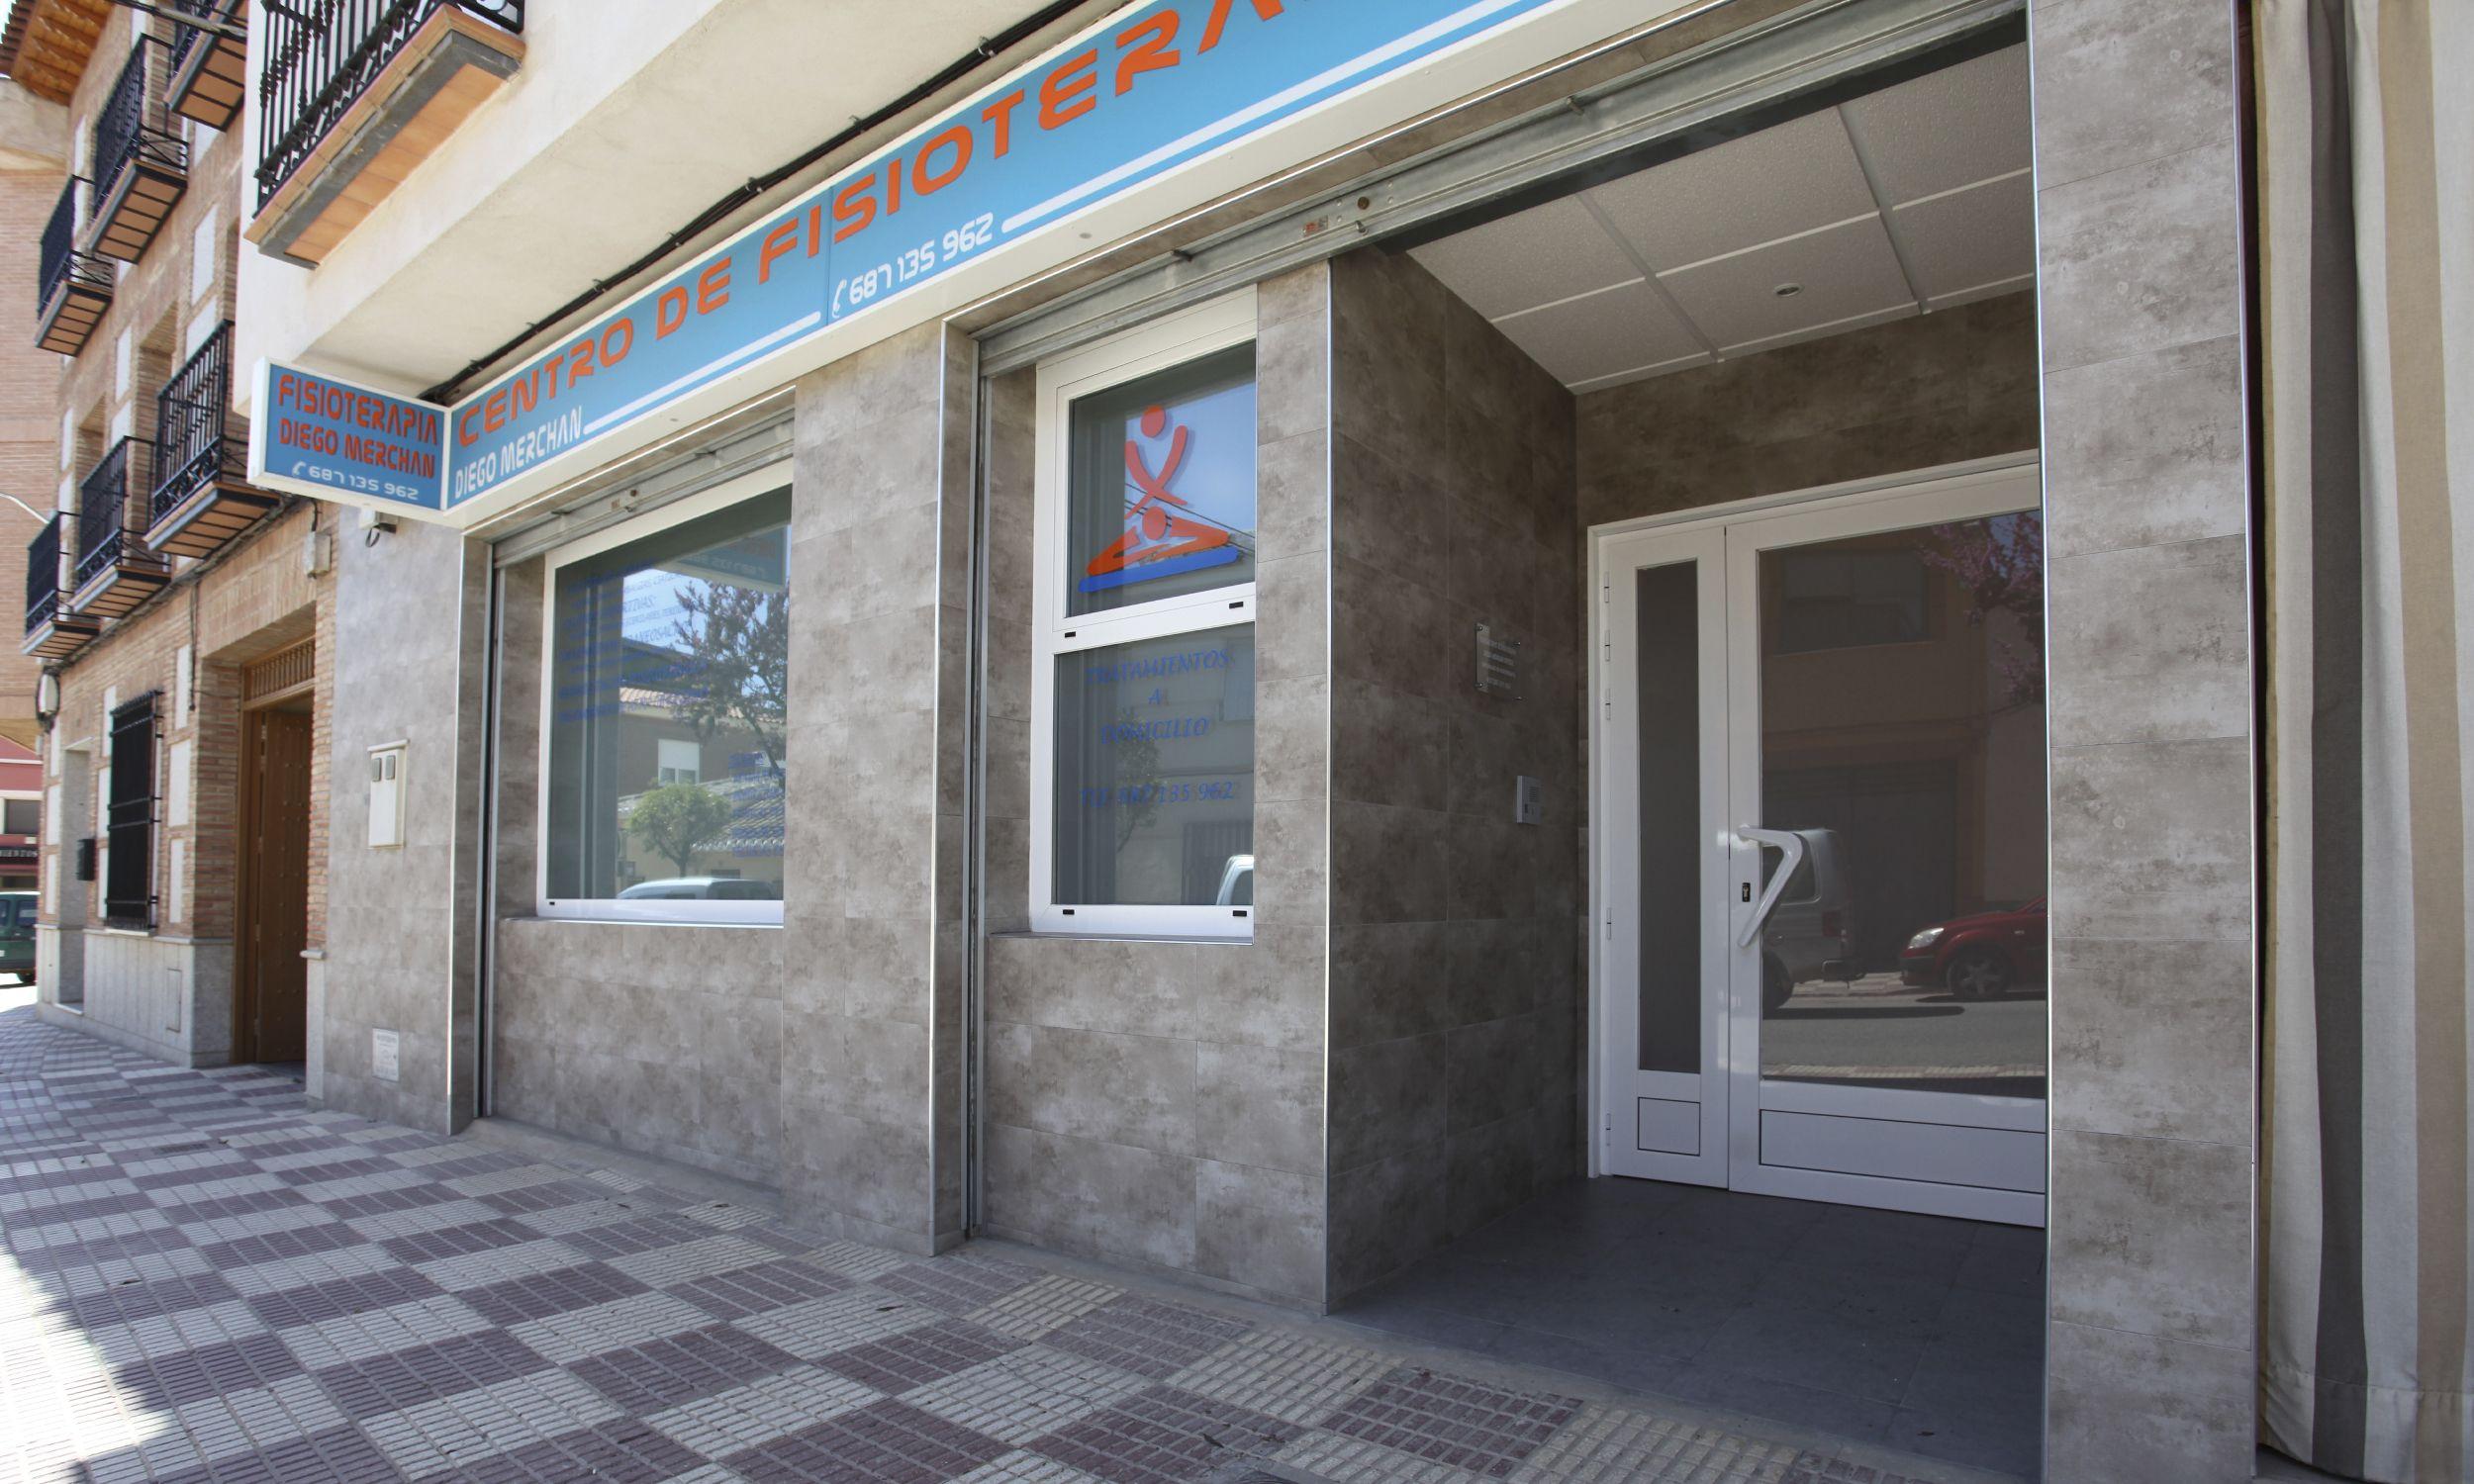 Centro de Fisioterapia Diego Merchán, Madridejos